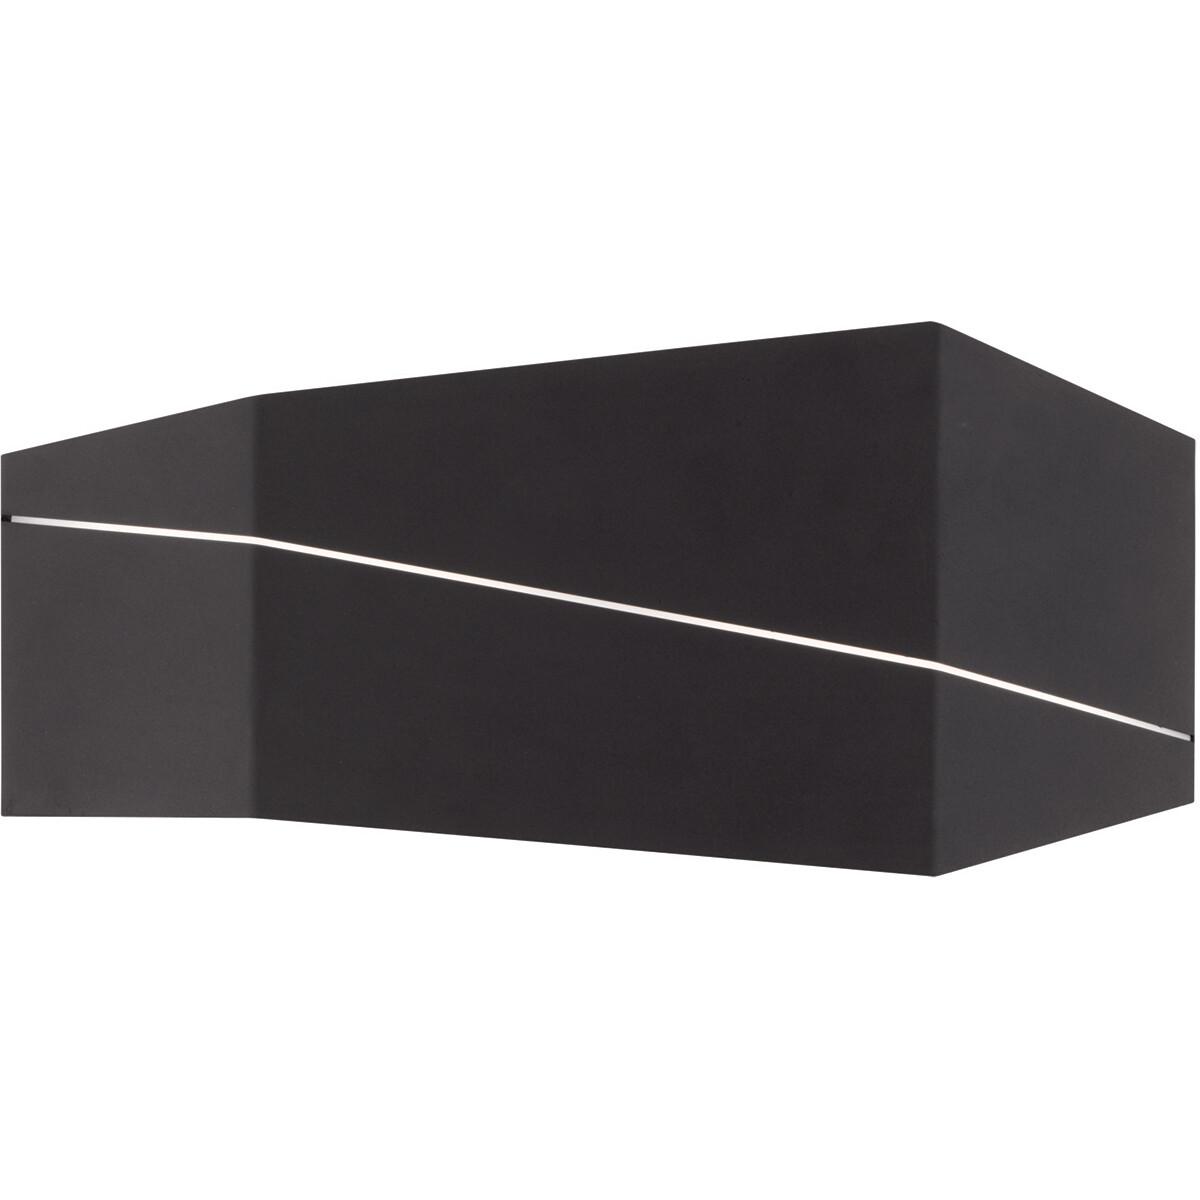 LED Wandlamp - Wandverlichting - Trion Zorran - 13W - Warm Wit 3000K - Rechthoek - Mat Zwart - Alumi